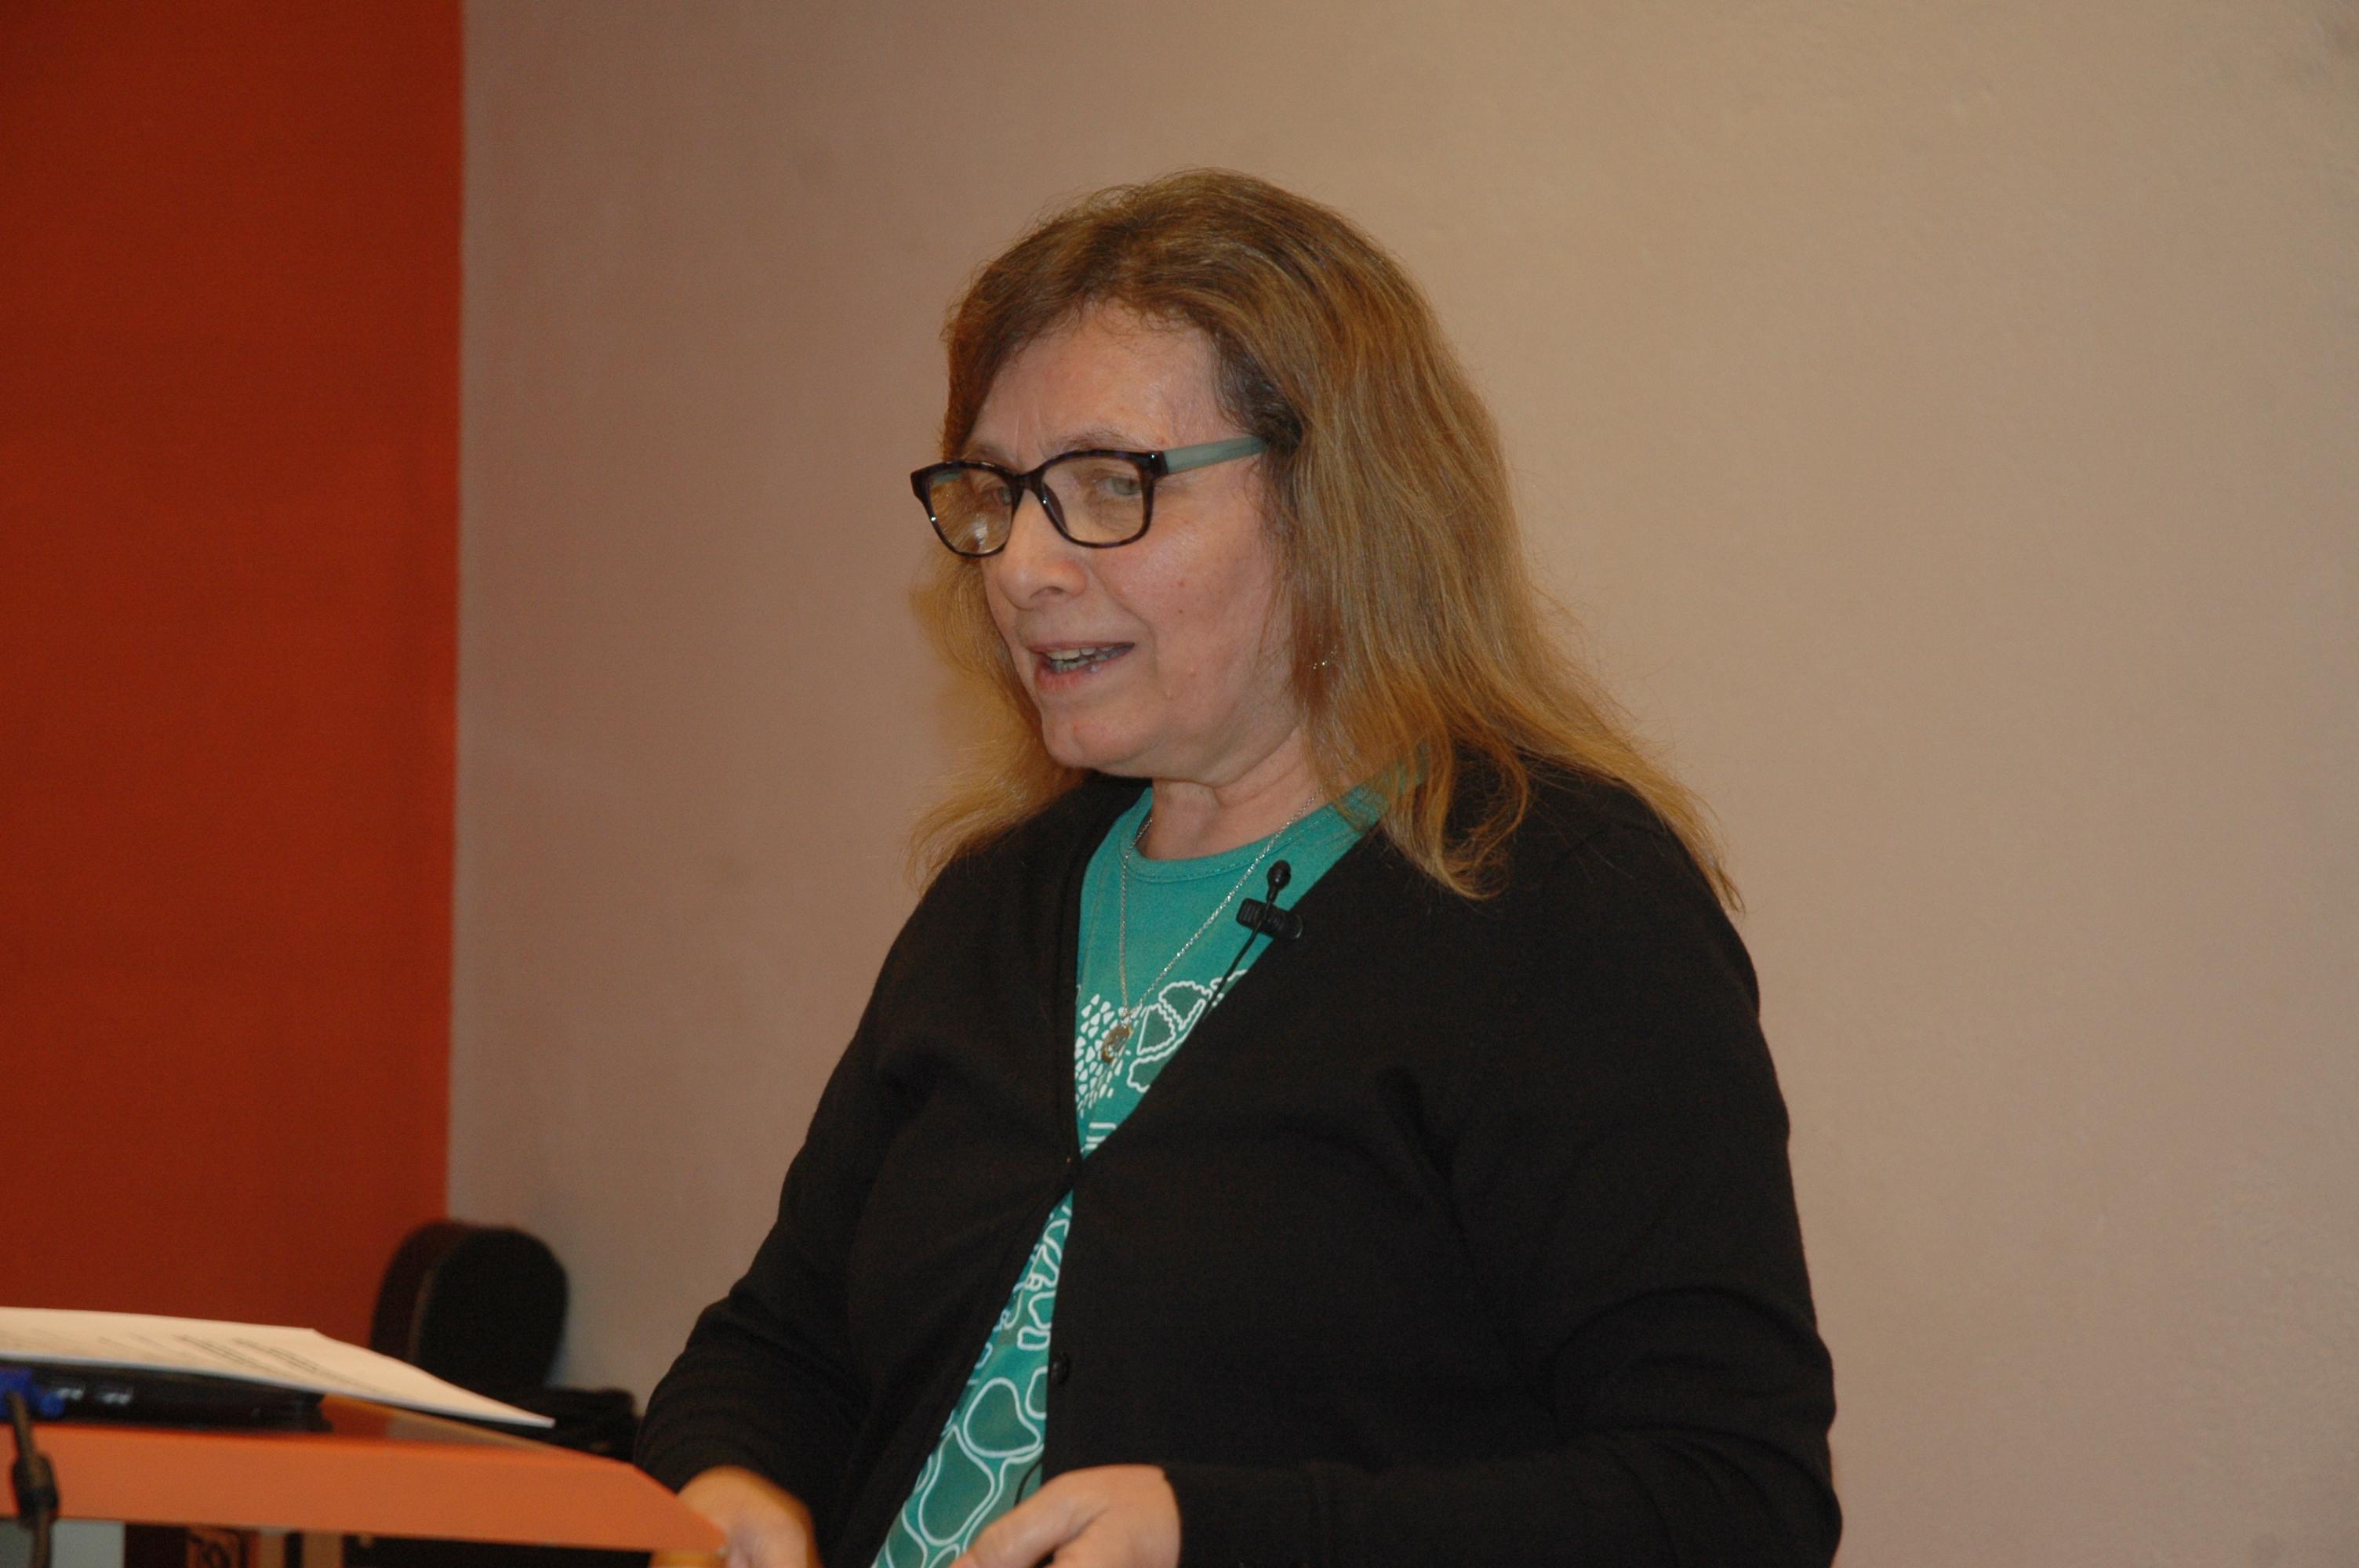 Yolène WIjesinghe